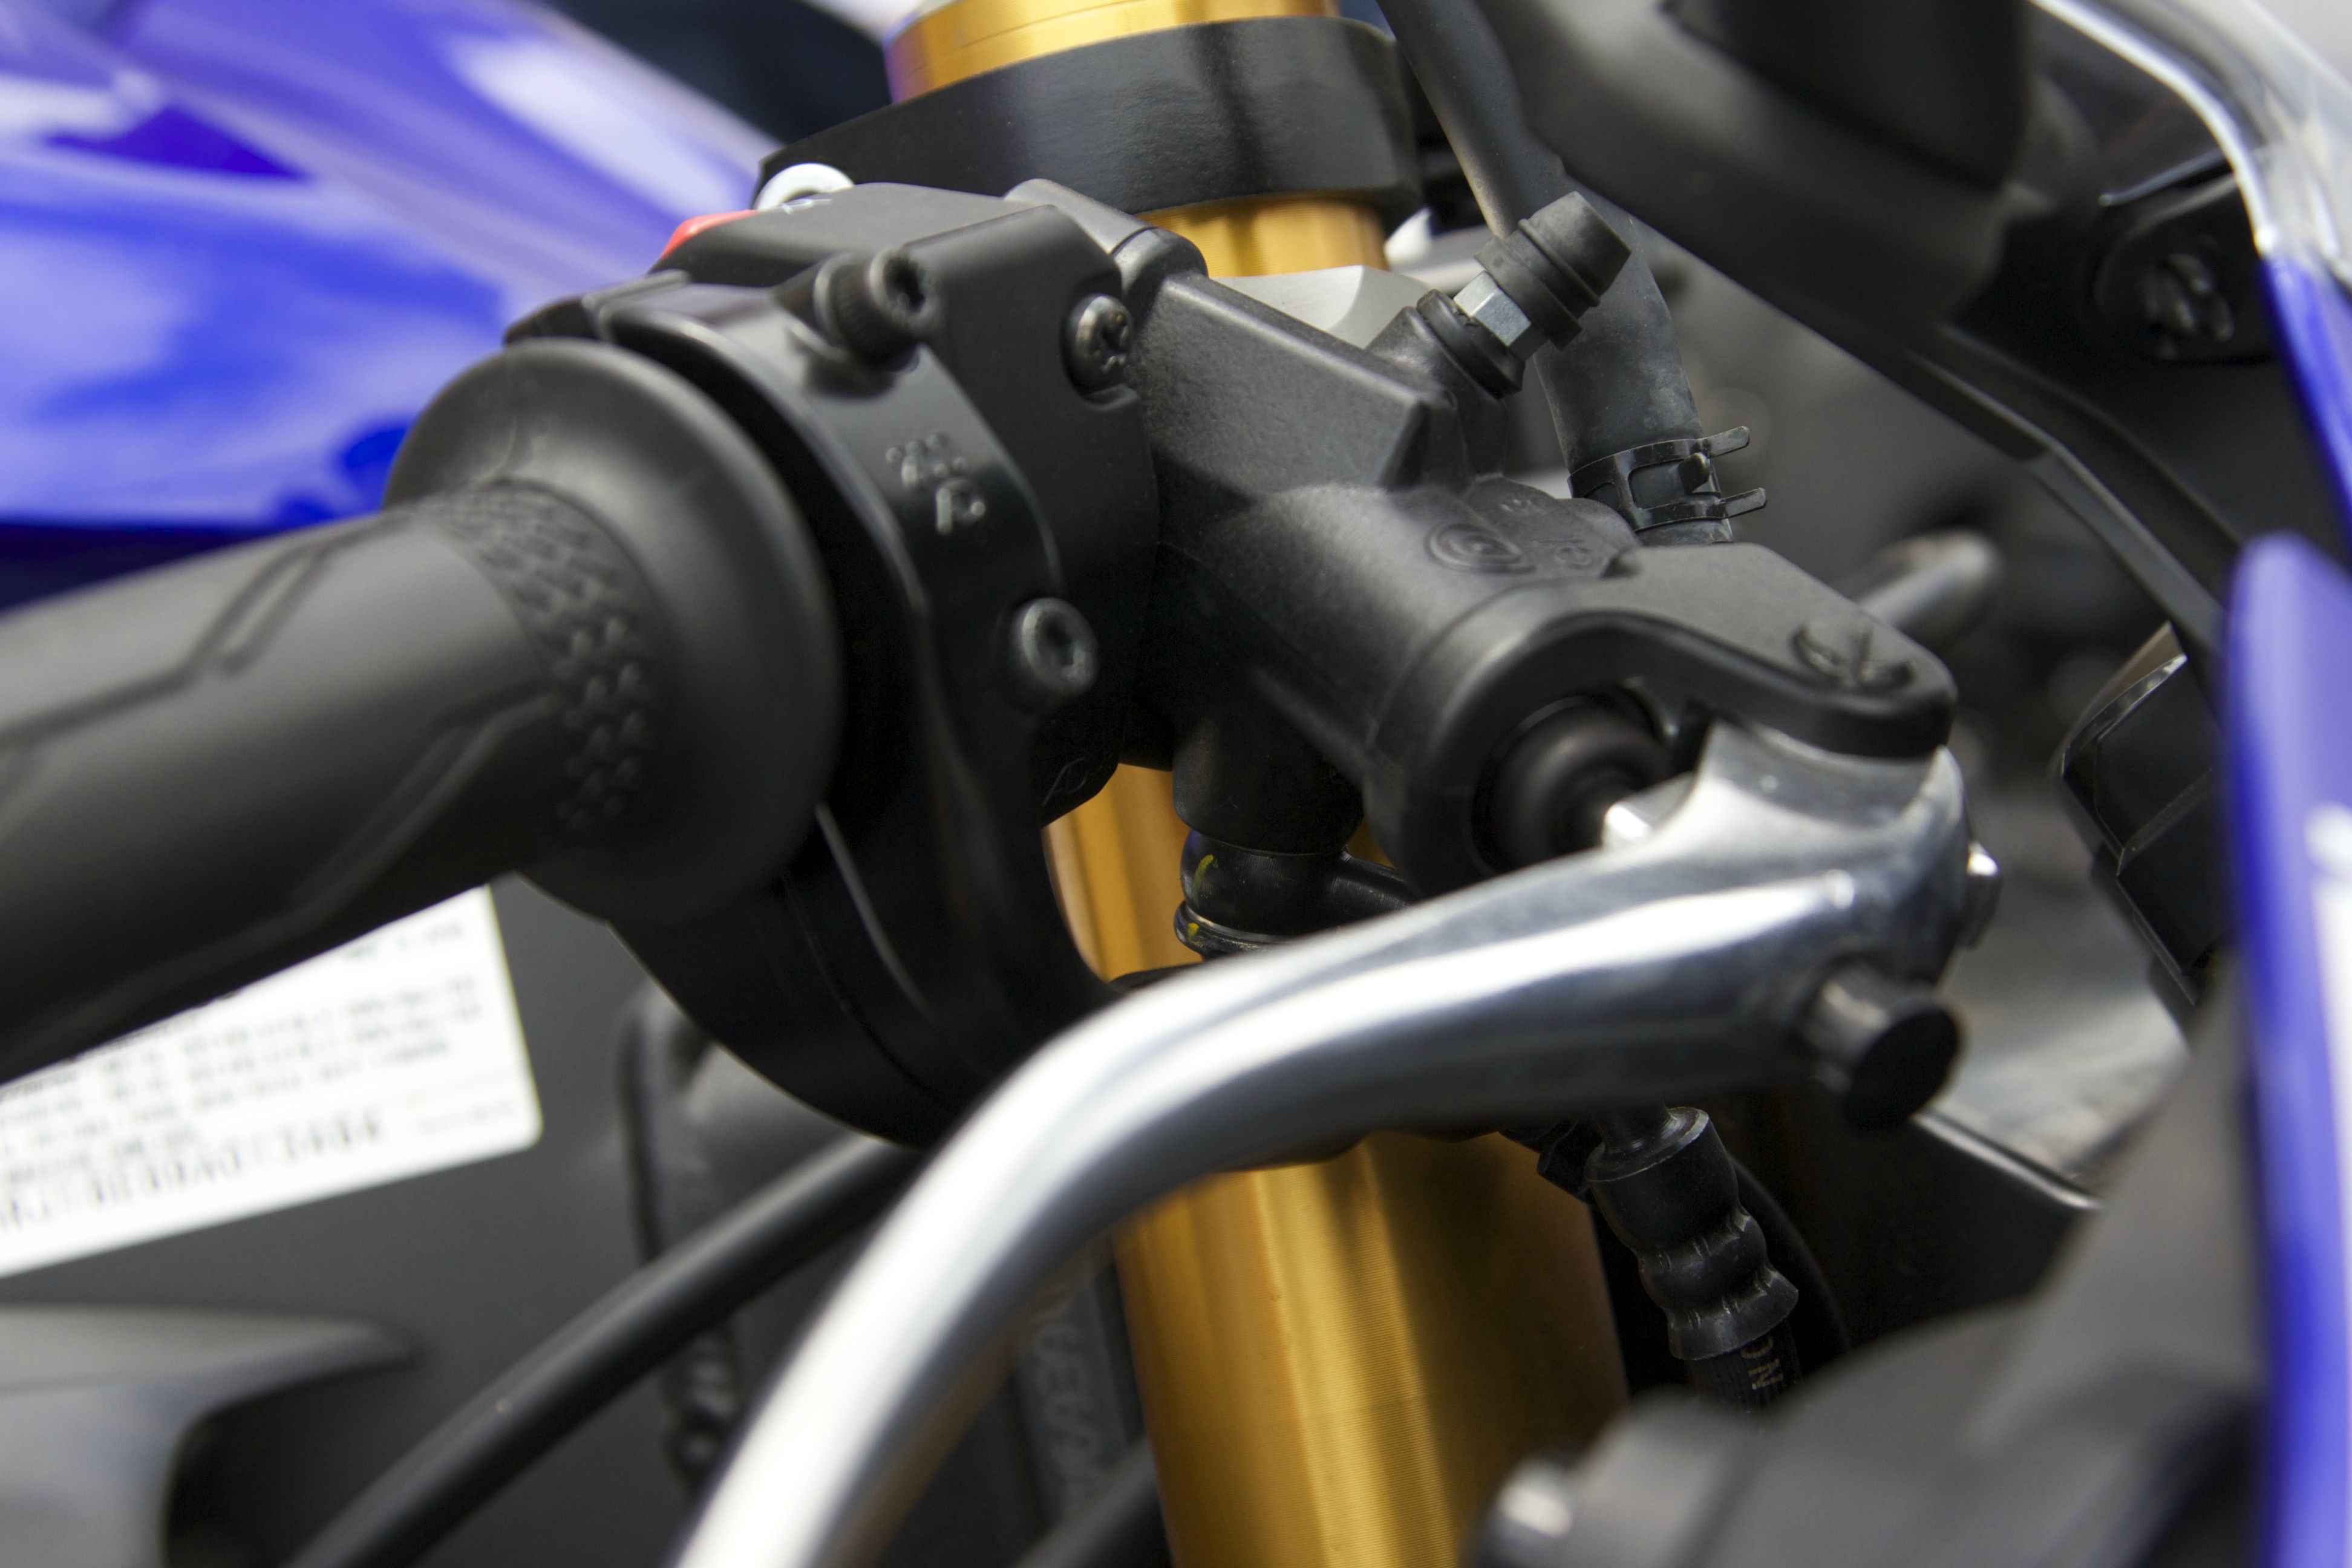 Back To Search Resultshome Motorcycle Hydraulic Brake Bleeder Clutch Tool Hose Valve Kit One Way Valve Tube Ra For Automotive Car Motor Brake Bleeder Kit